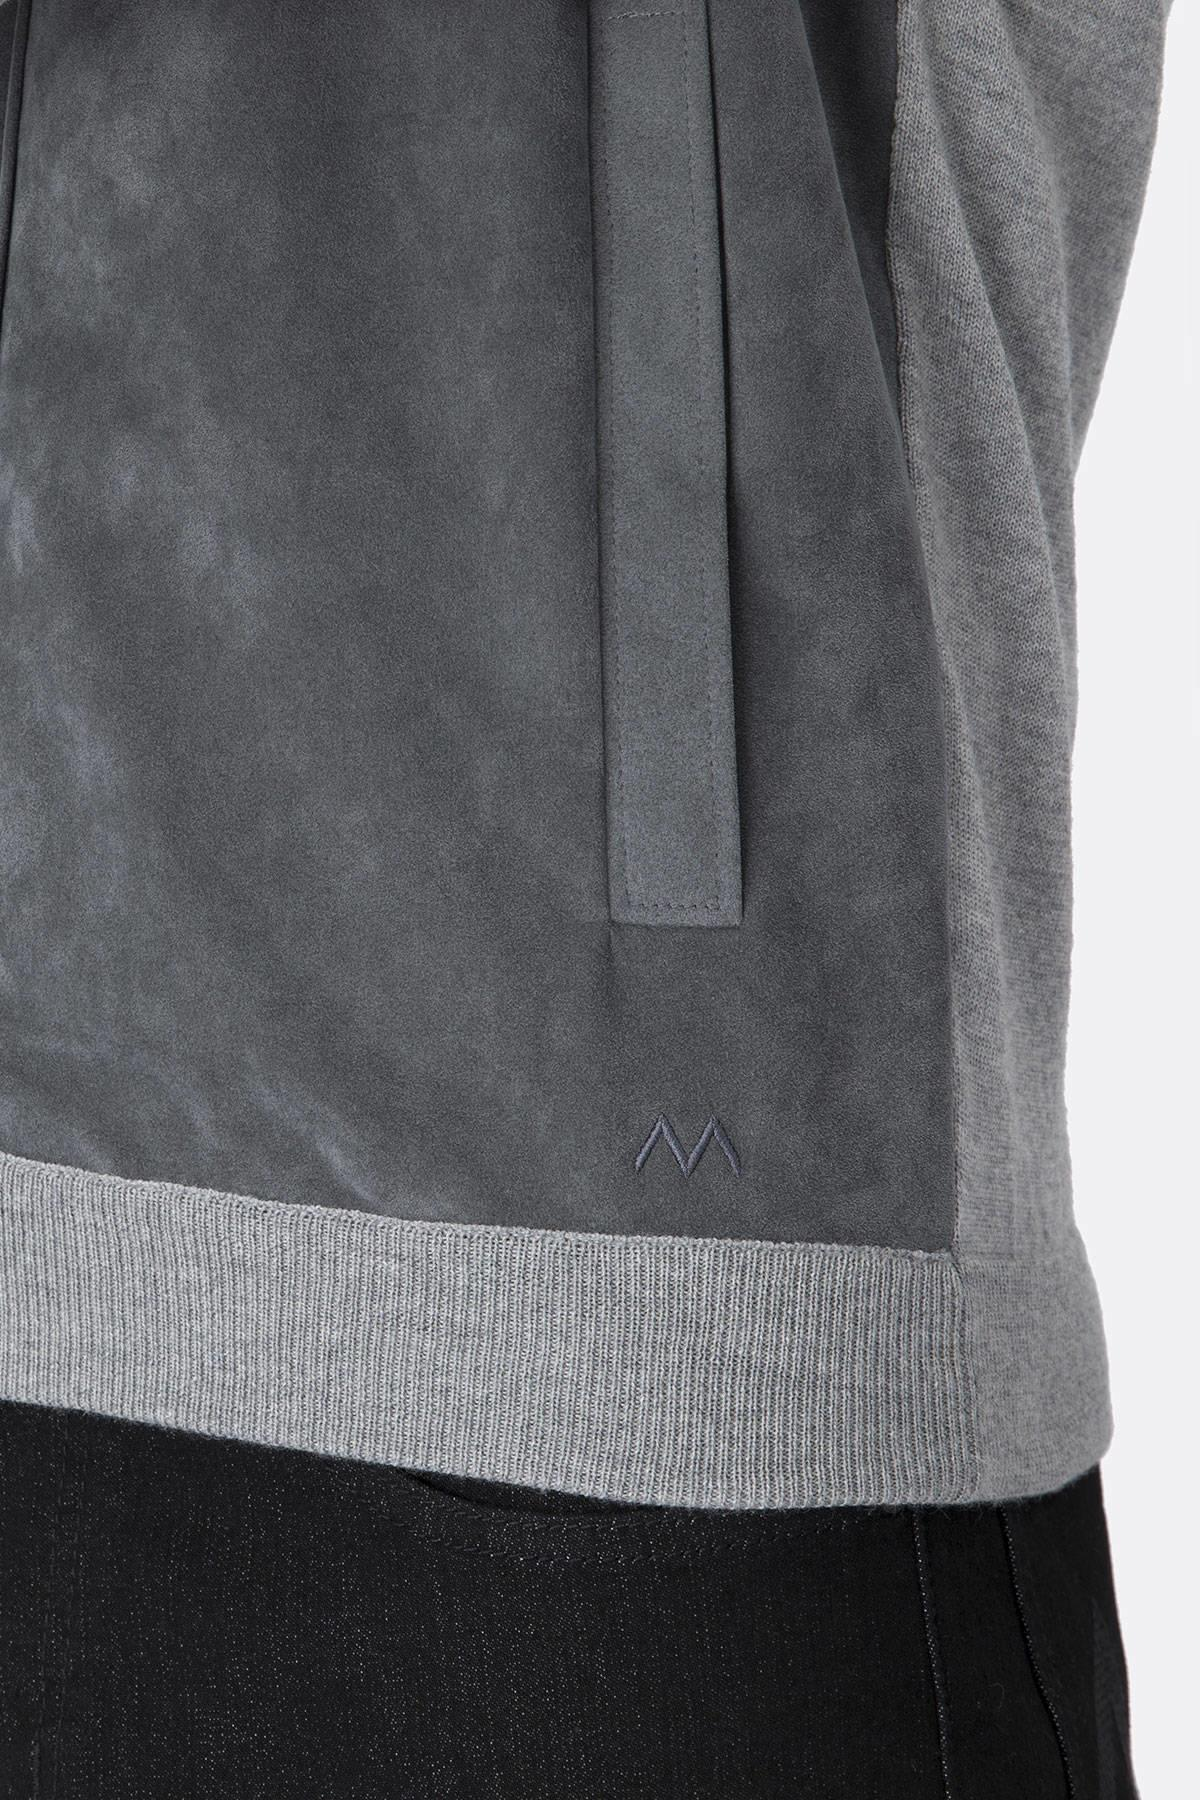 Extrafine Merino Açık Gri Spor Triko Ceket